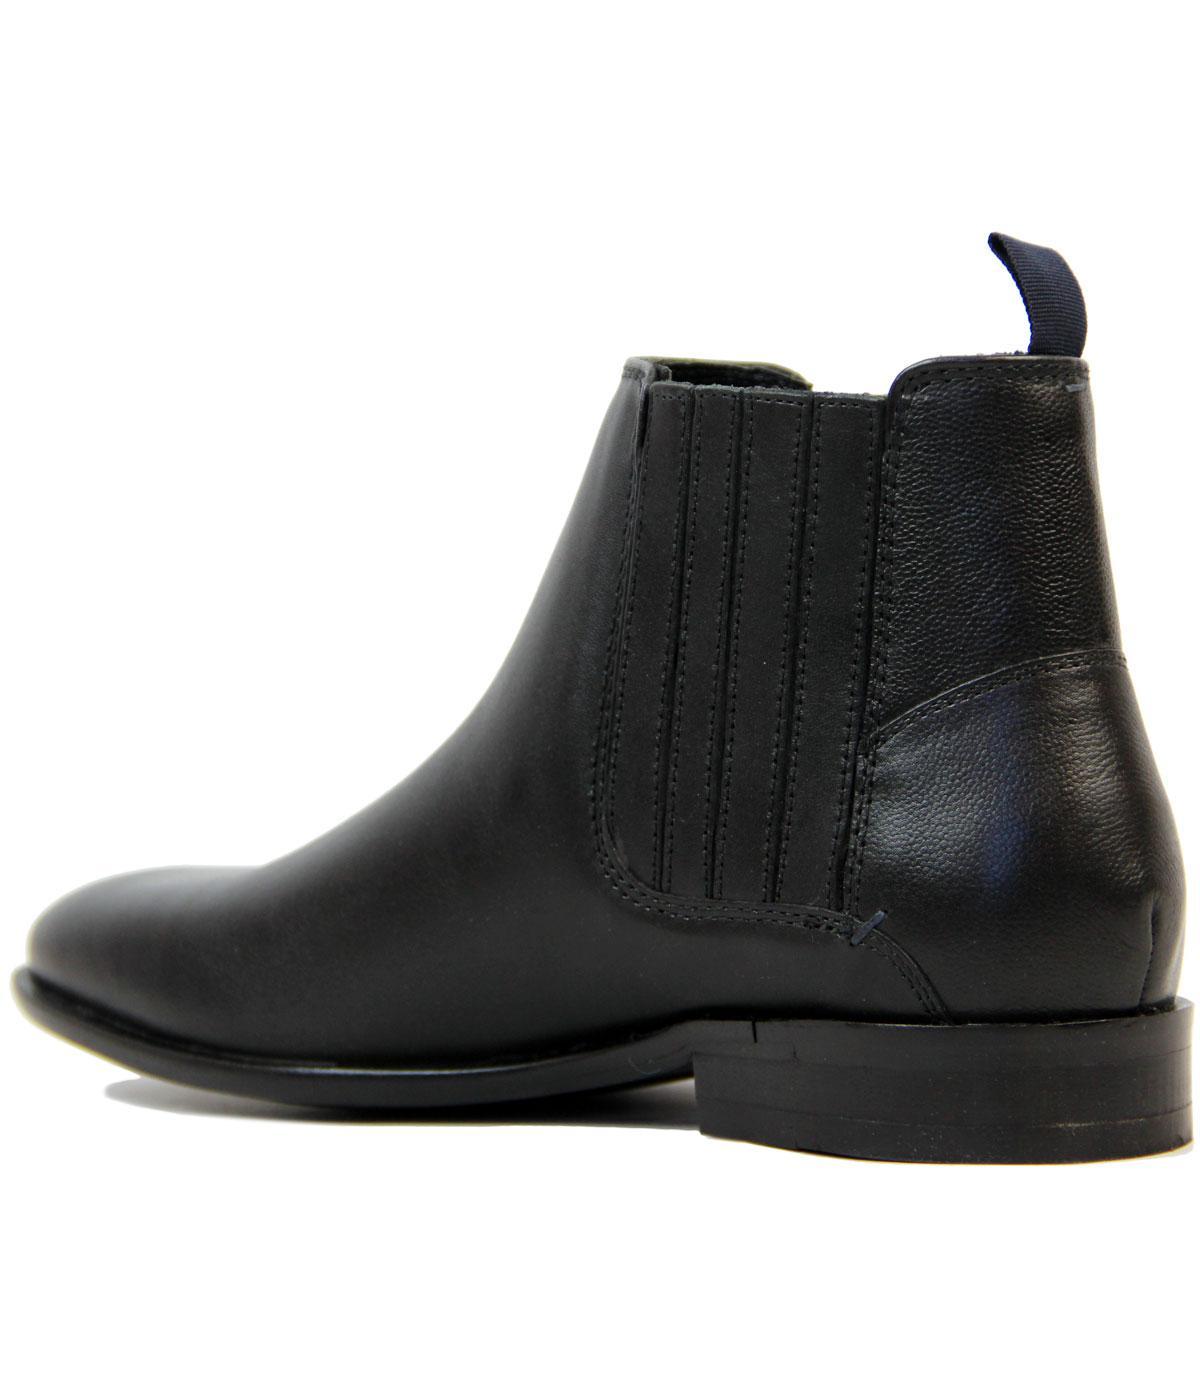 515f1019f99 Rame BEN SHERMAN Retro Mod Leather Chelsea Boots